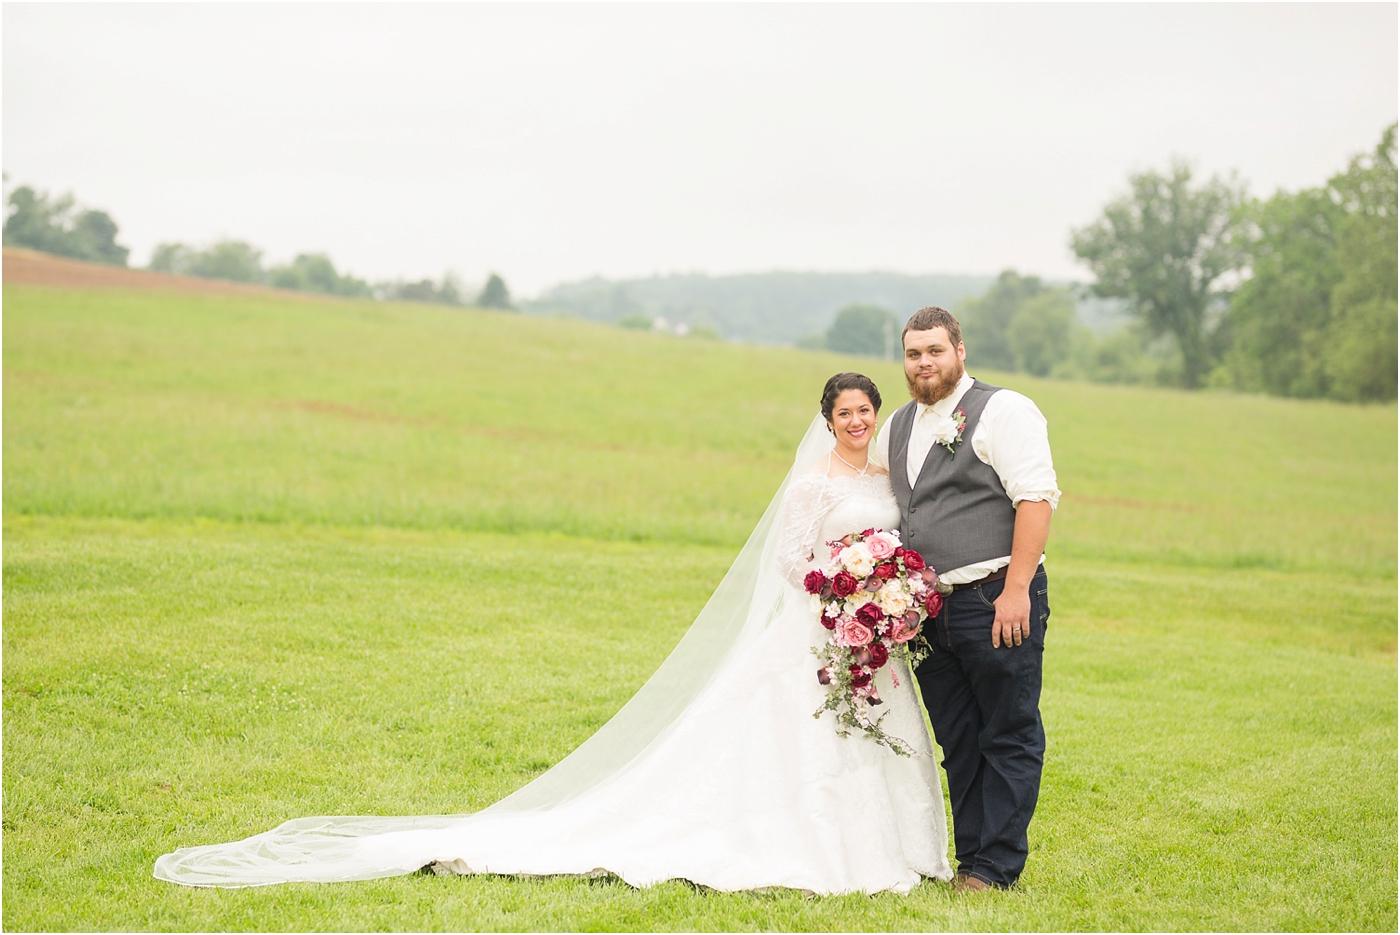 Maryland-Barn-Wedding-Photos-87.jpg